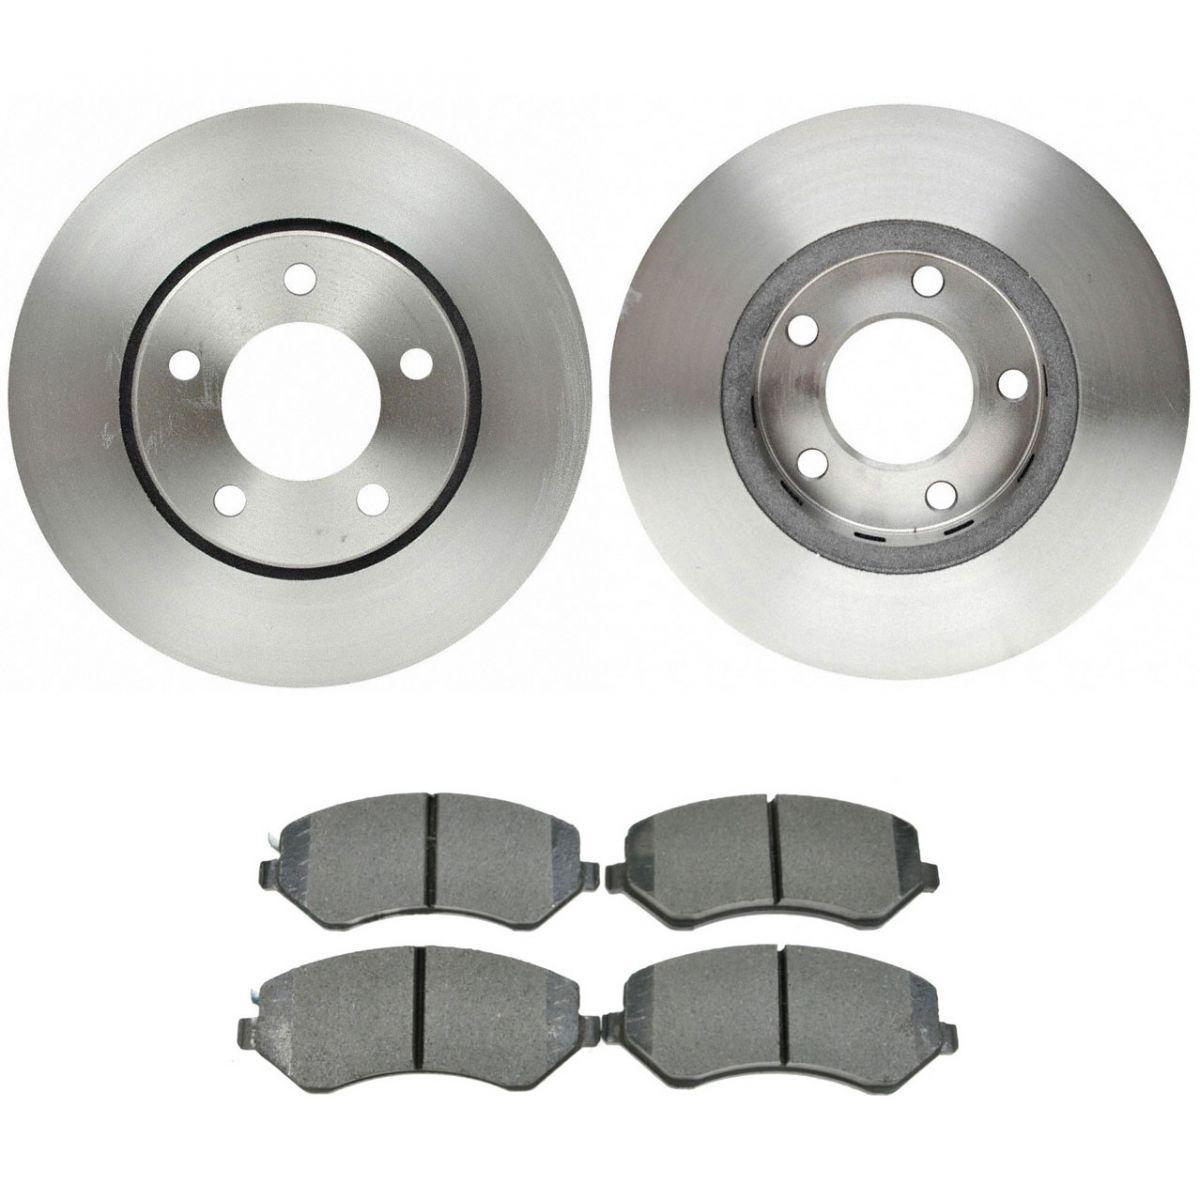 Front Disc Brake Pad /& Rotor Kit Set RAYBESTOS for Caravan